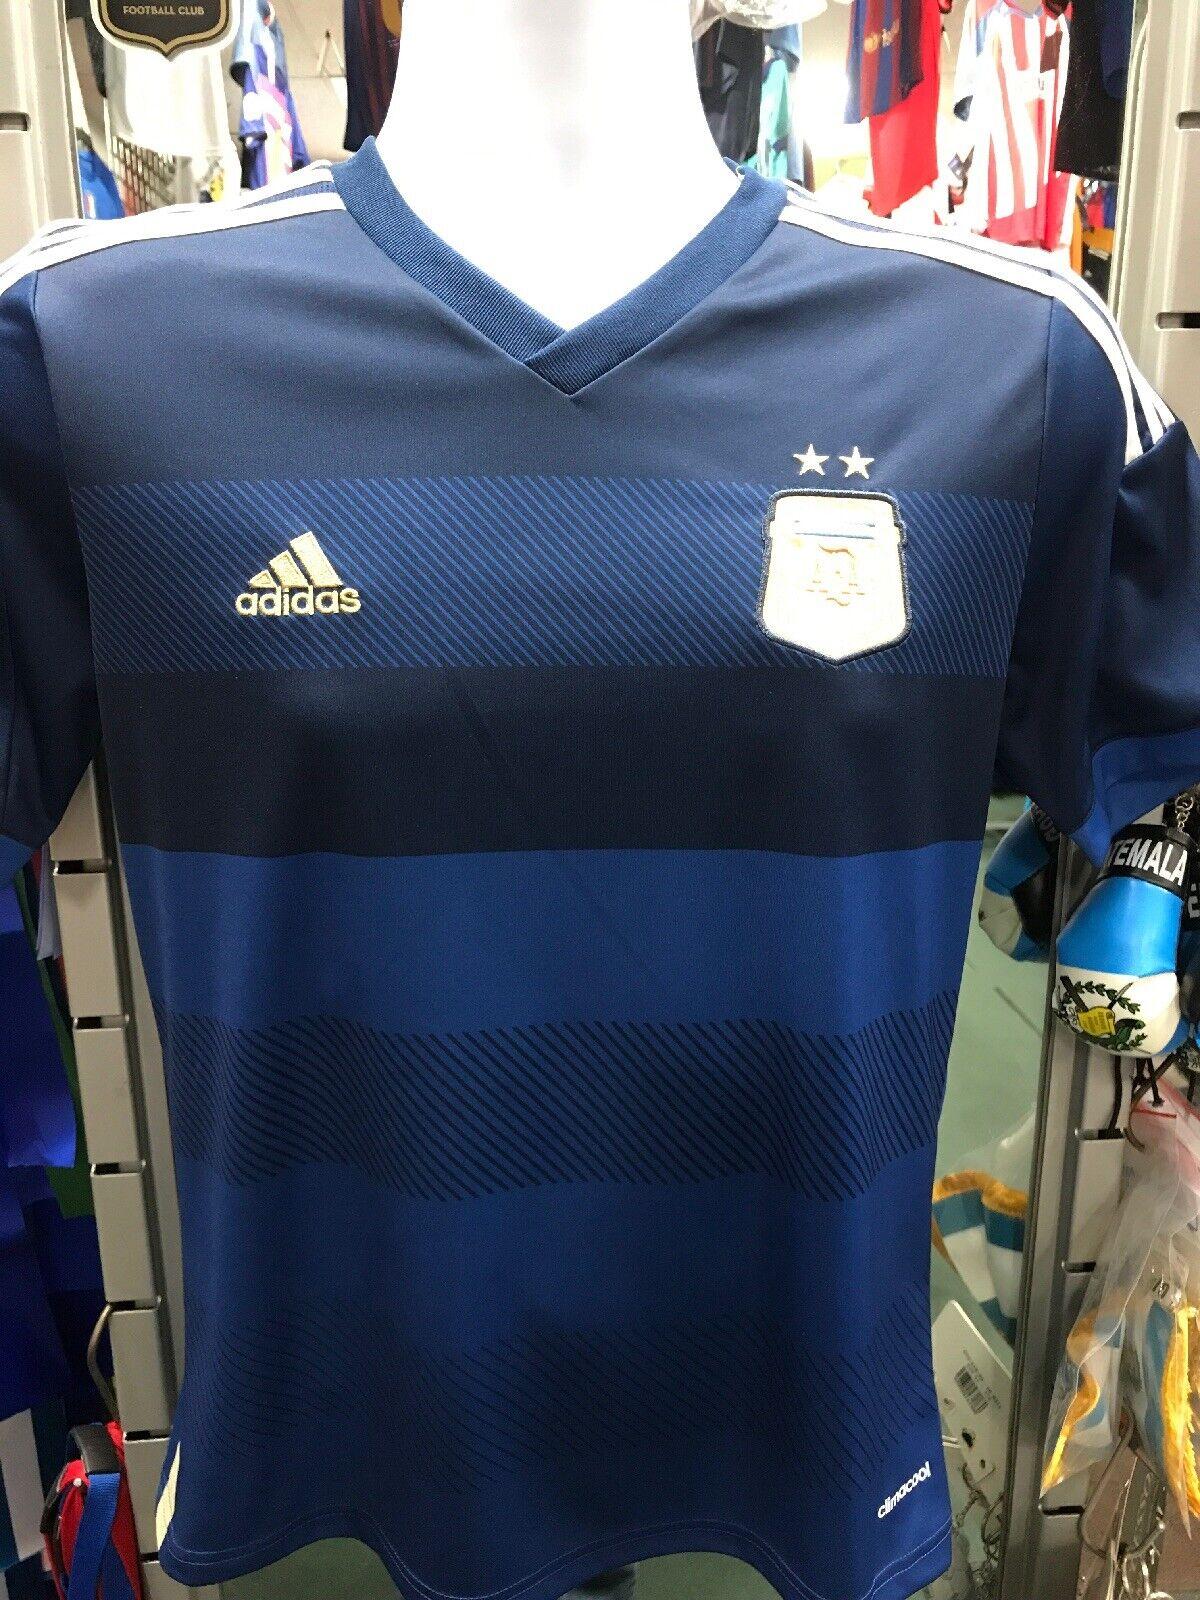 adidas Argentina Away Navy Blue 2014 Soccer Jersey Size YL ...